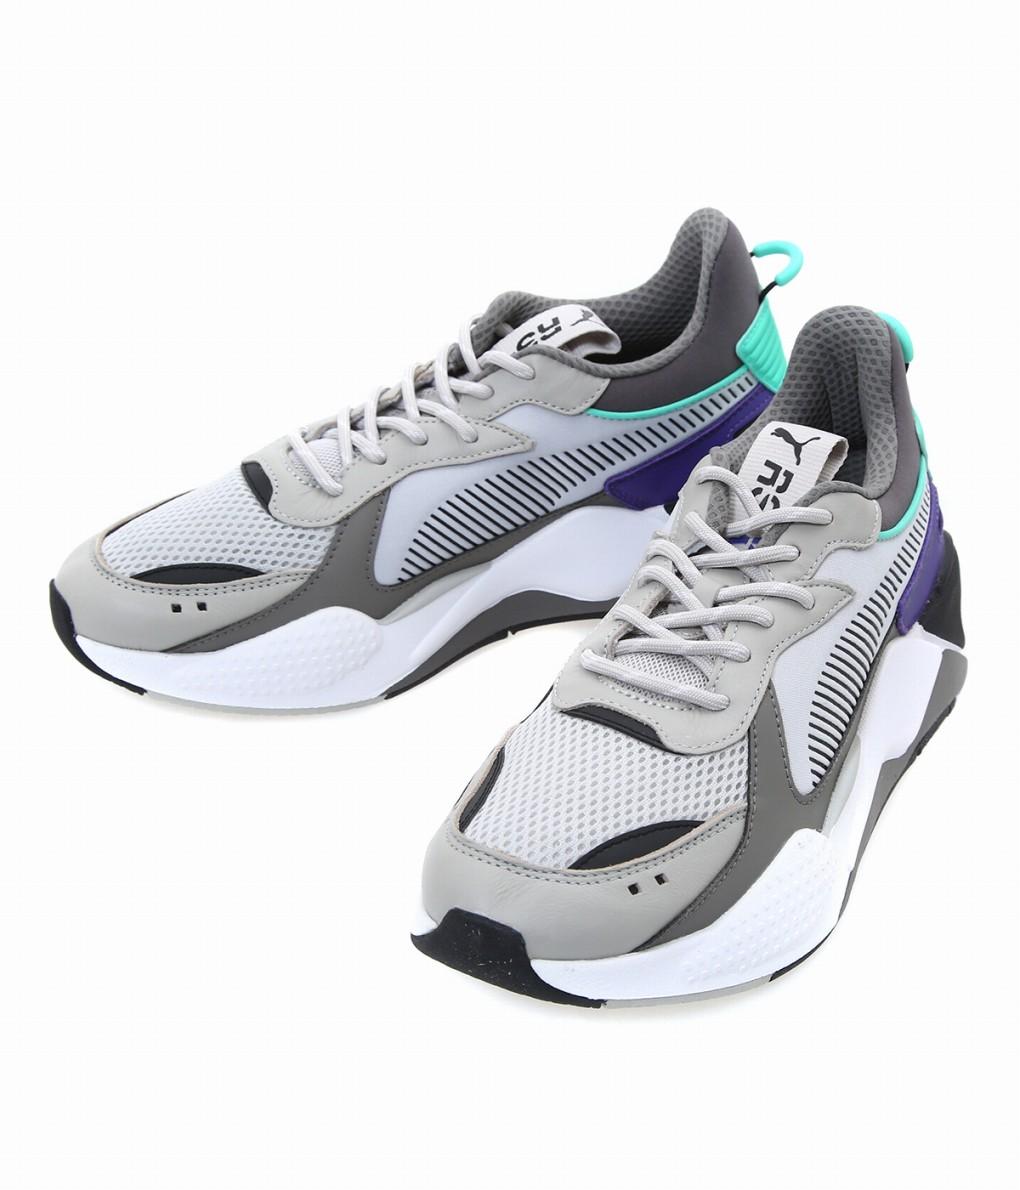 PUMA / プーマ : RS-X TRACKS 01 グレーバイオレット : プーマ スニーカー シューズ 靴 メンズ : 369332 【AST】